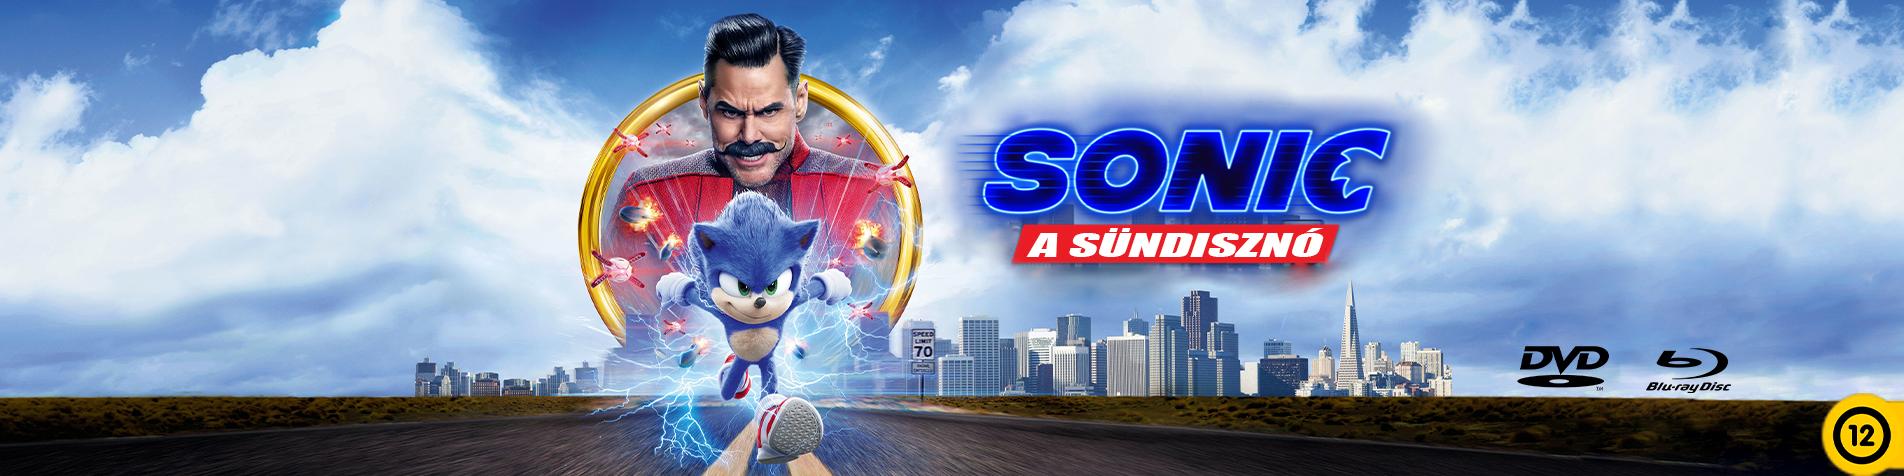 Sonic - DVD